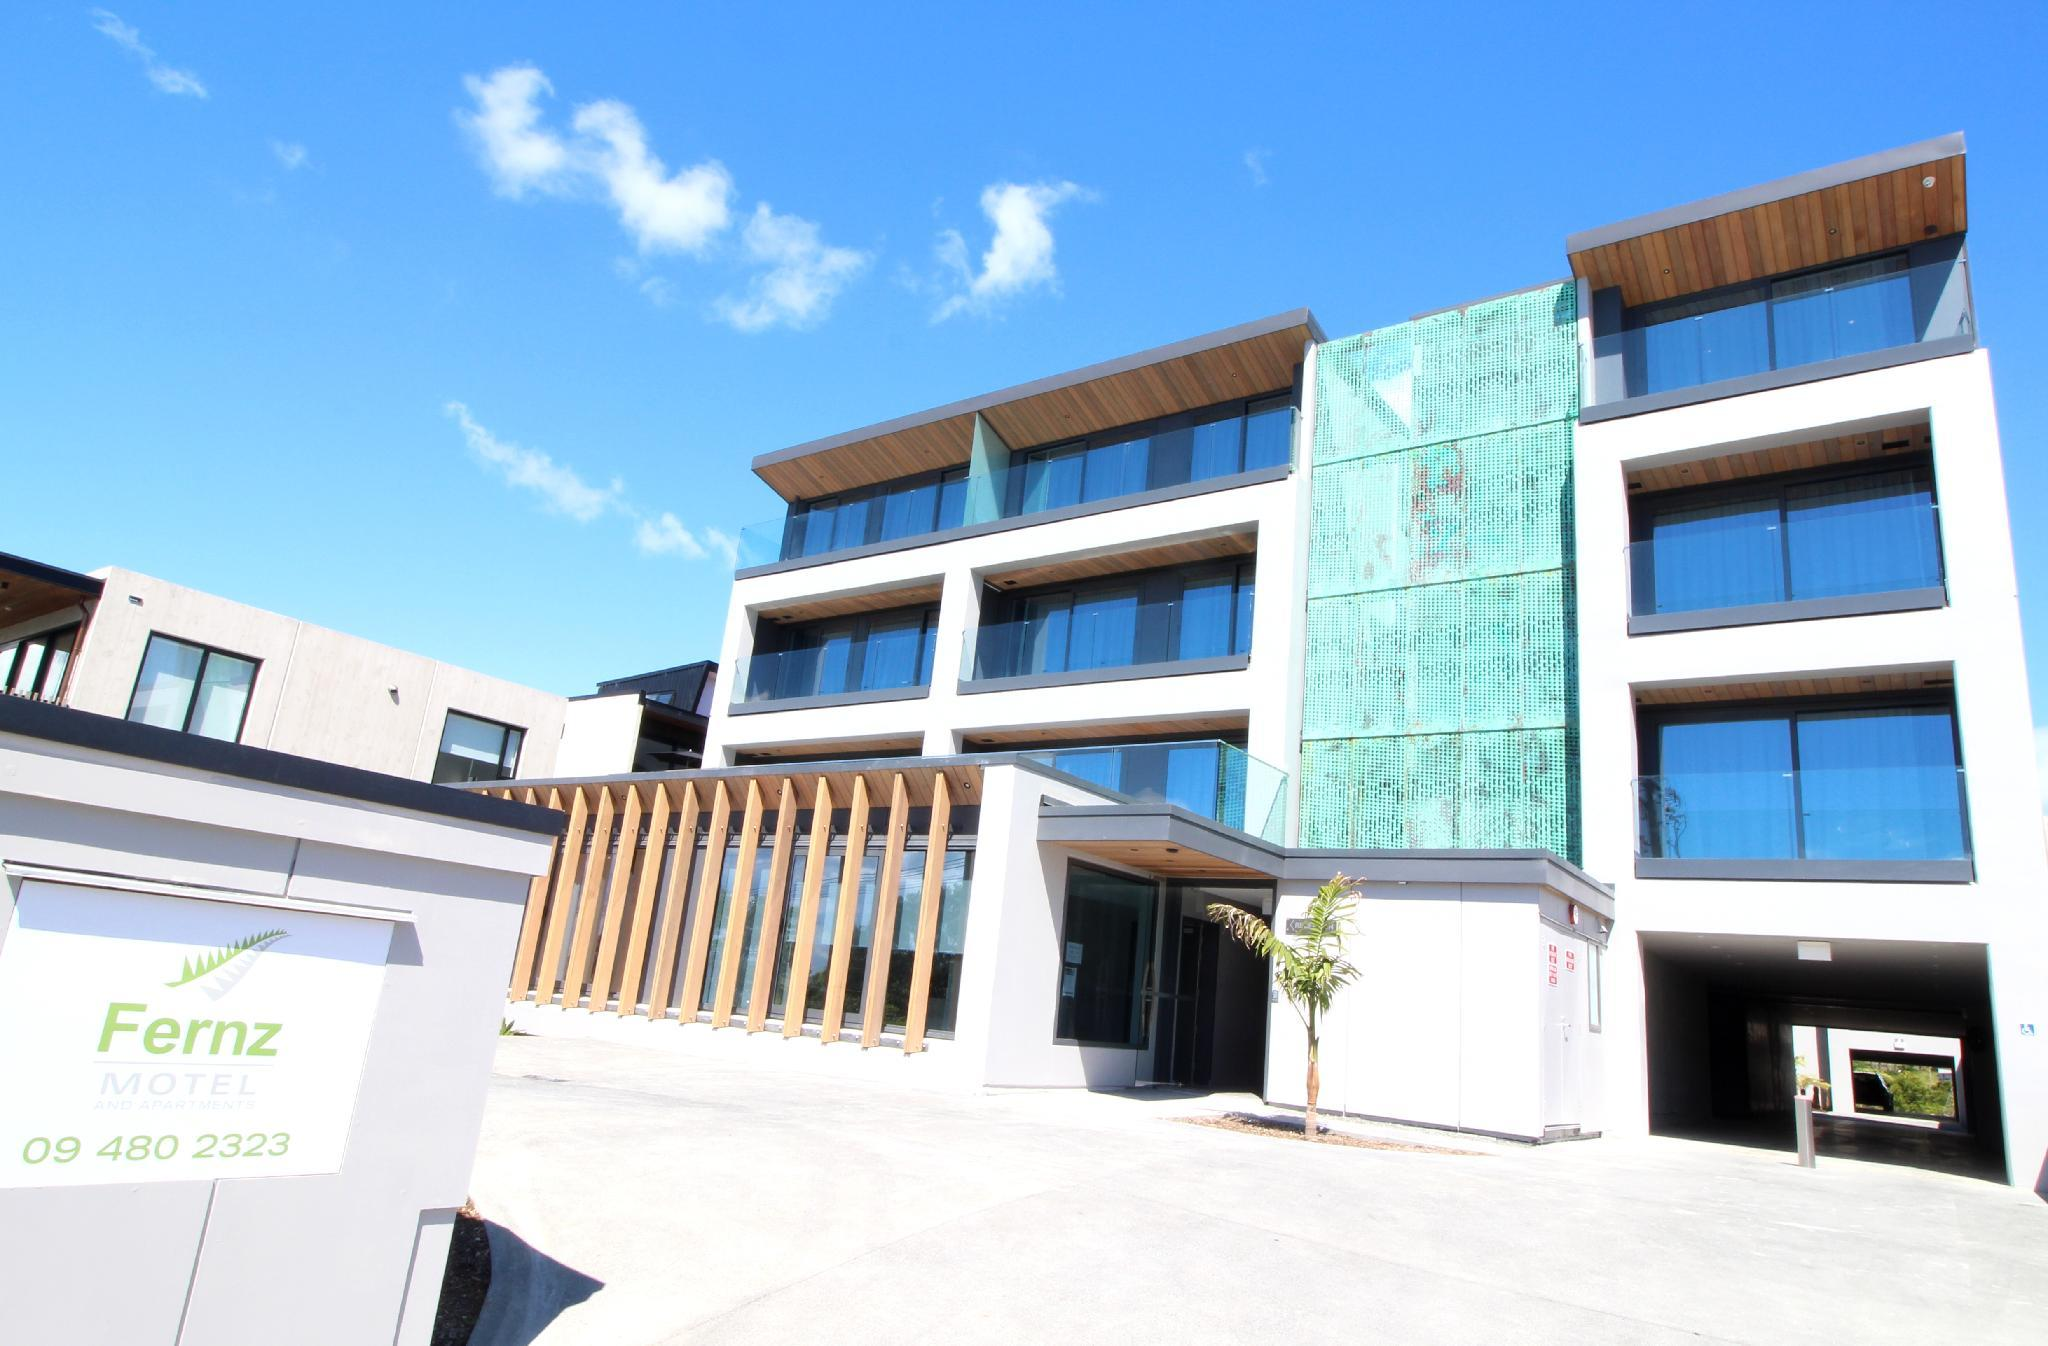 FERNZ Motel And Serviced Apartments Birkenhead